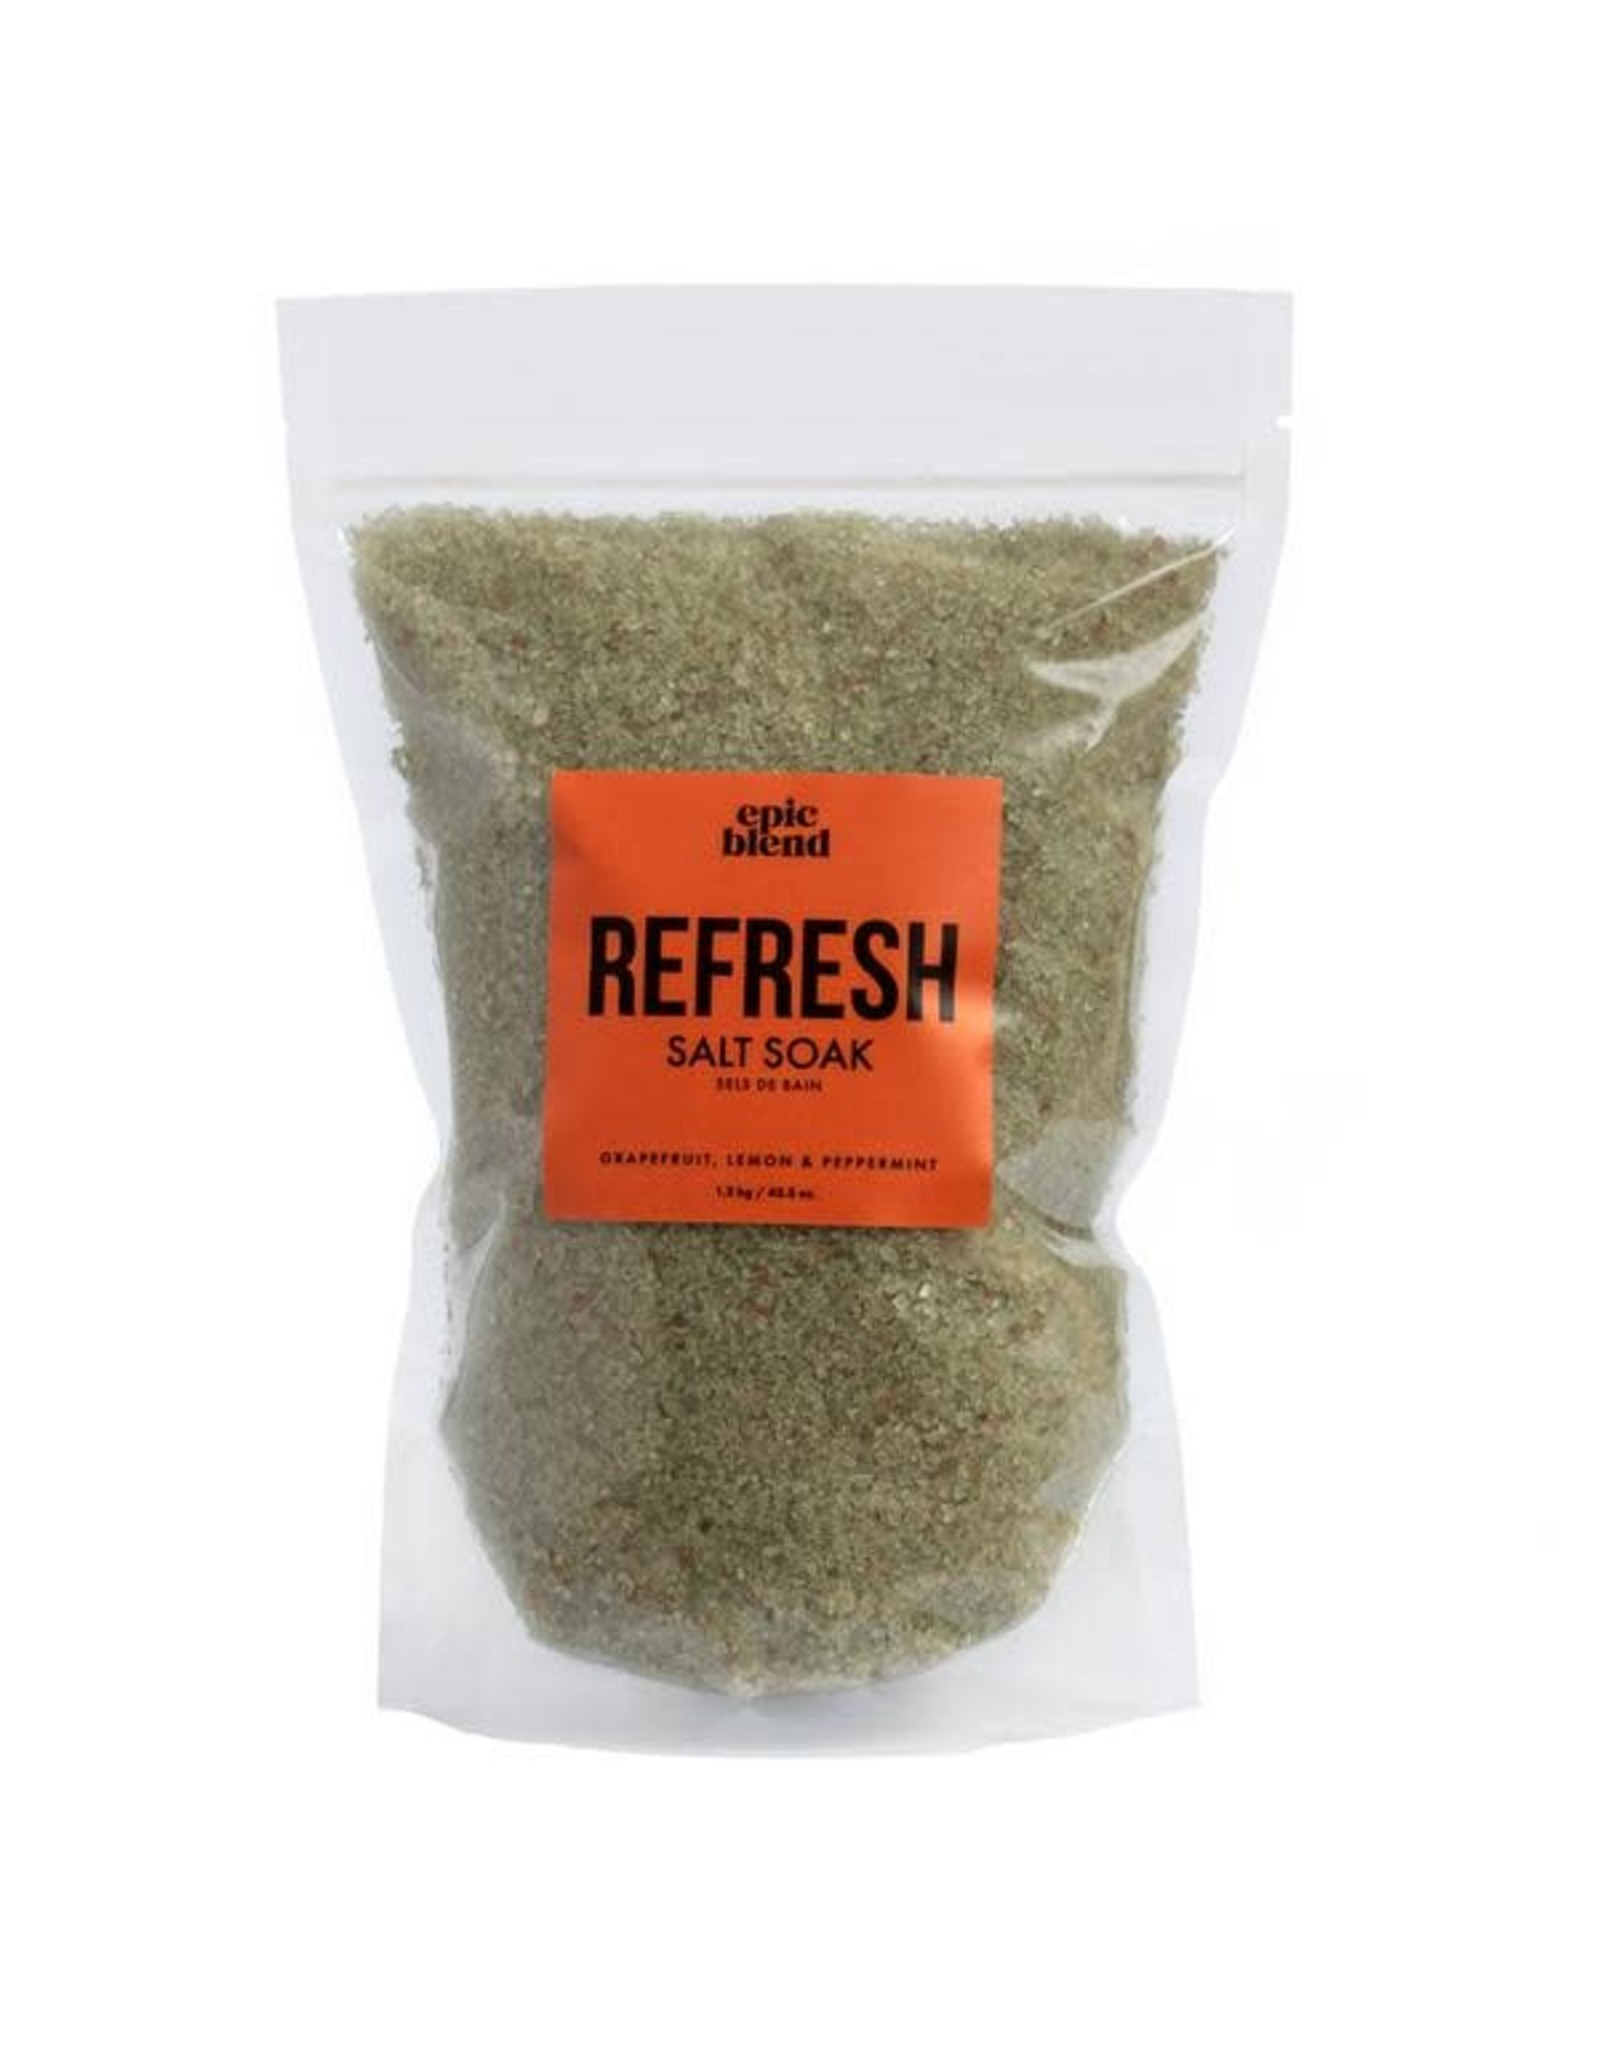 Epic Blend Refresh Salt Soak